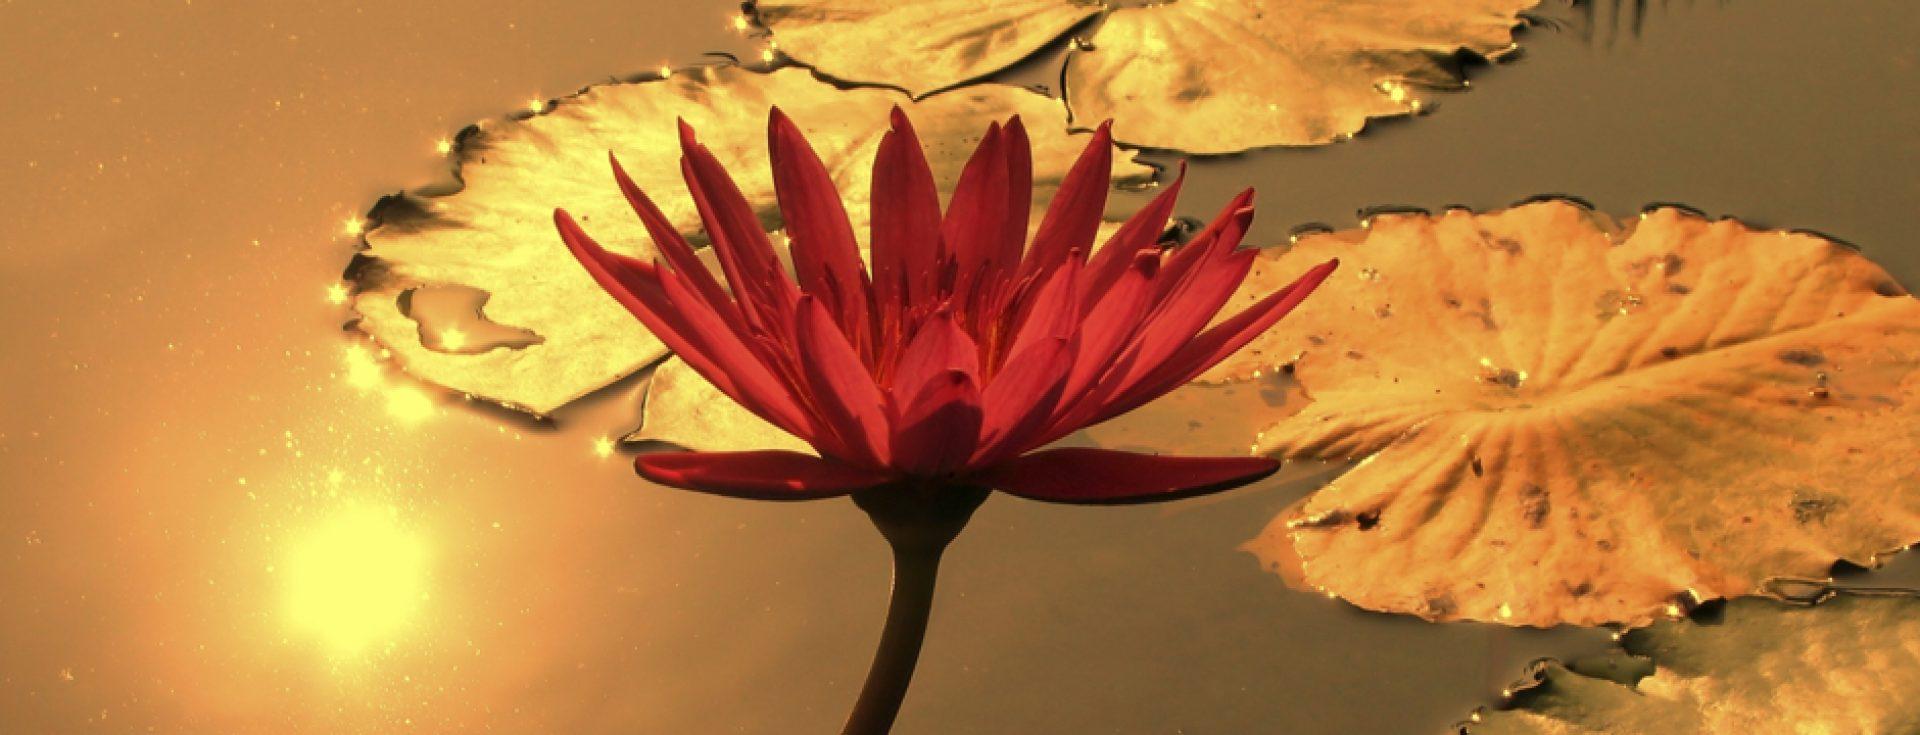 Acceptance & Compassion